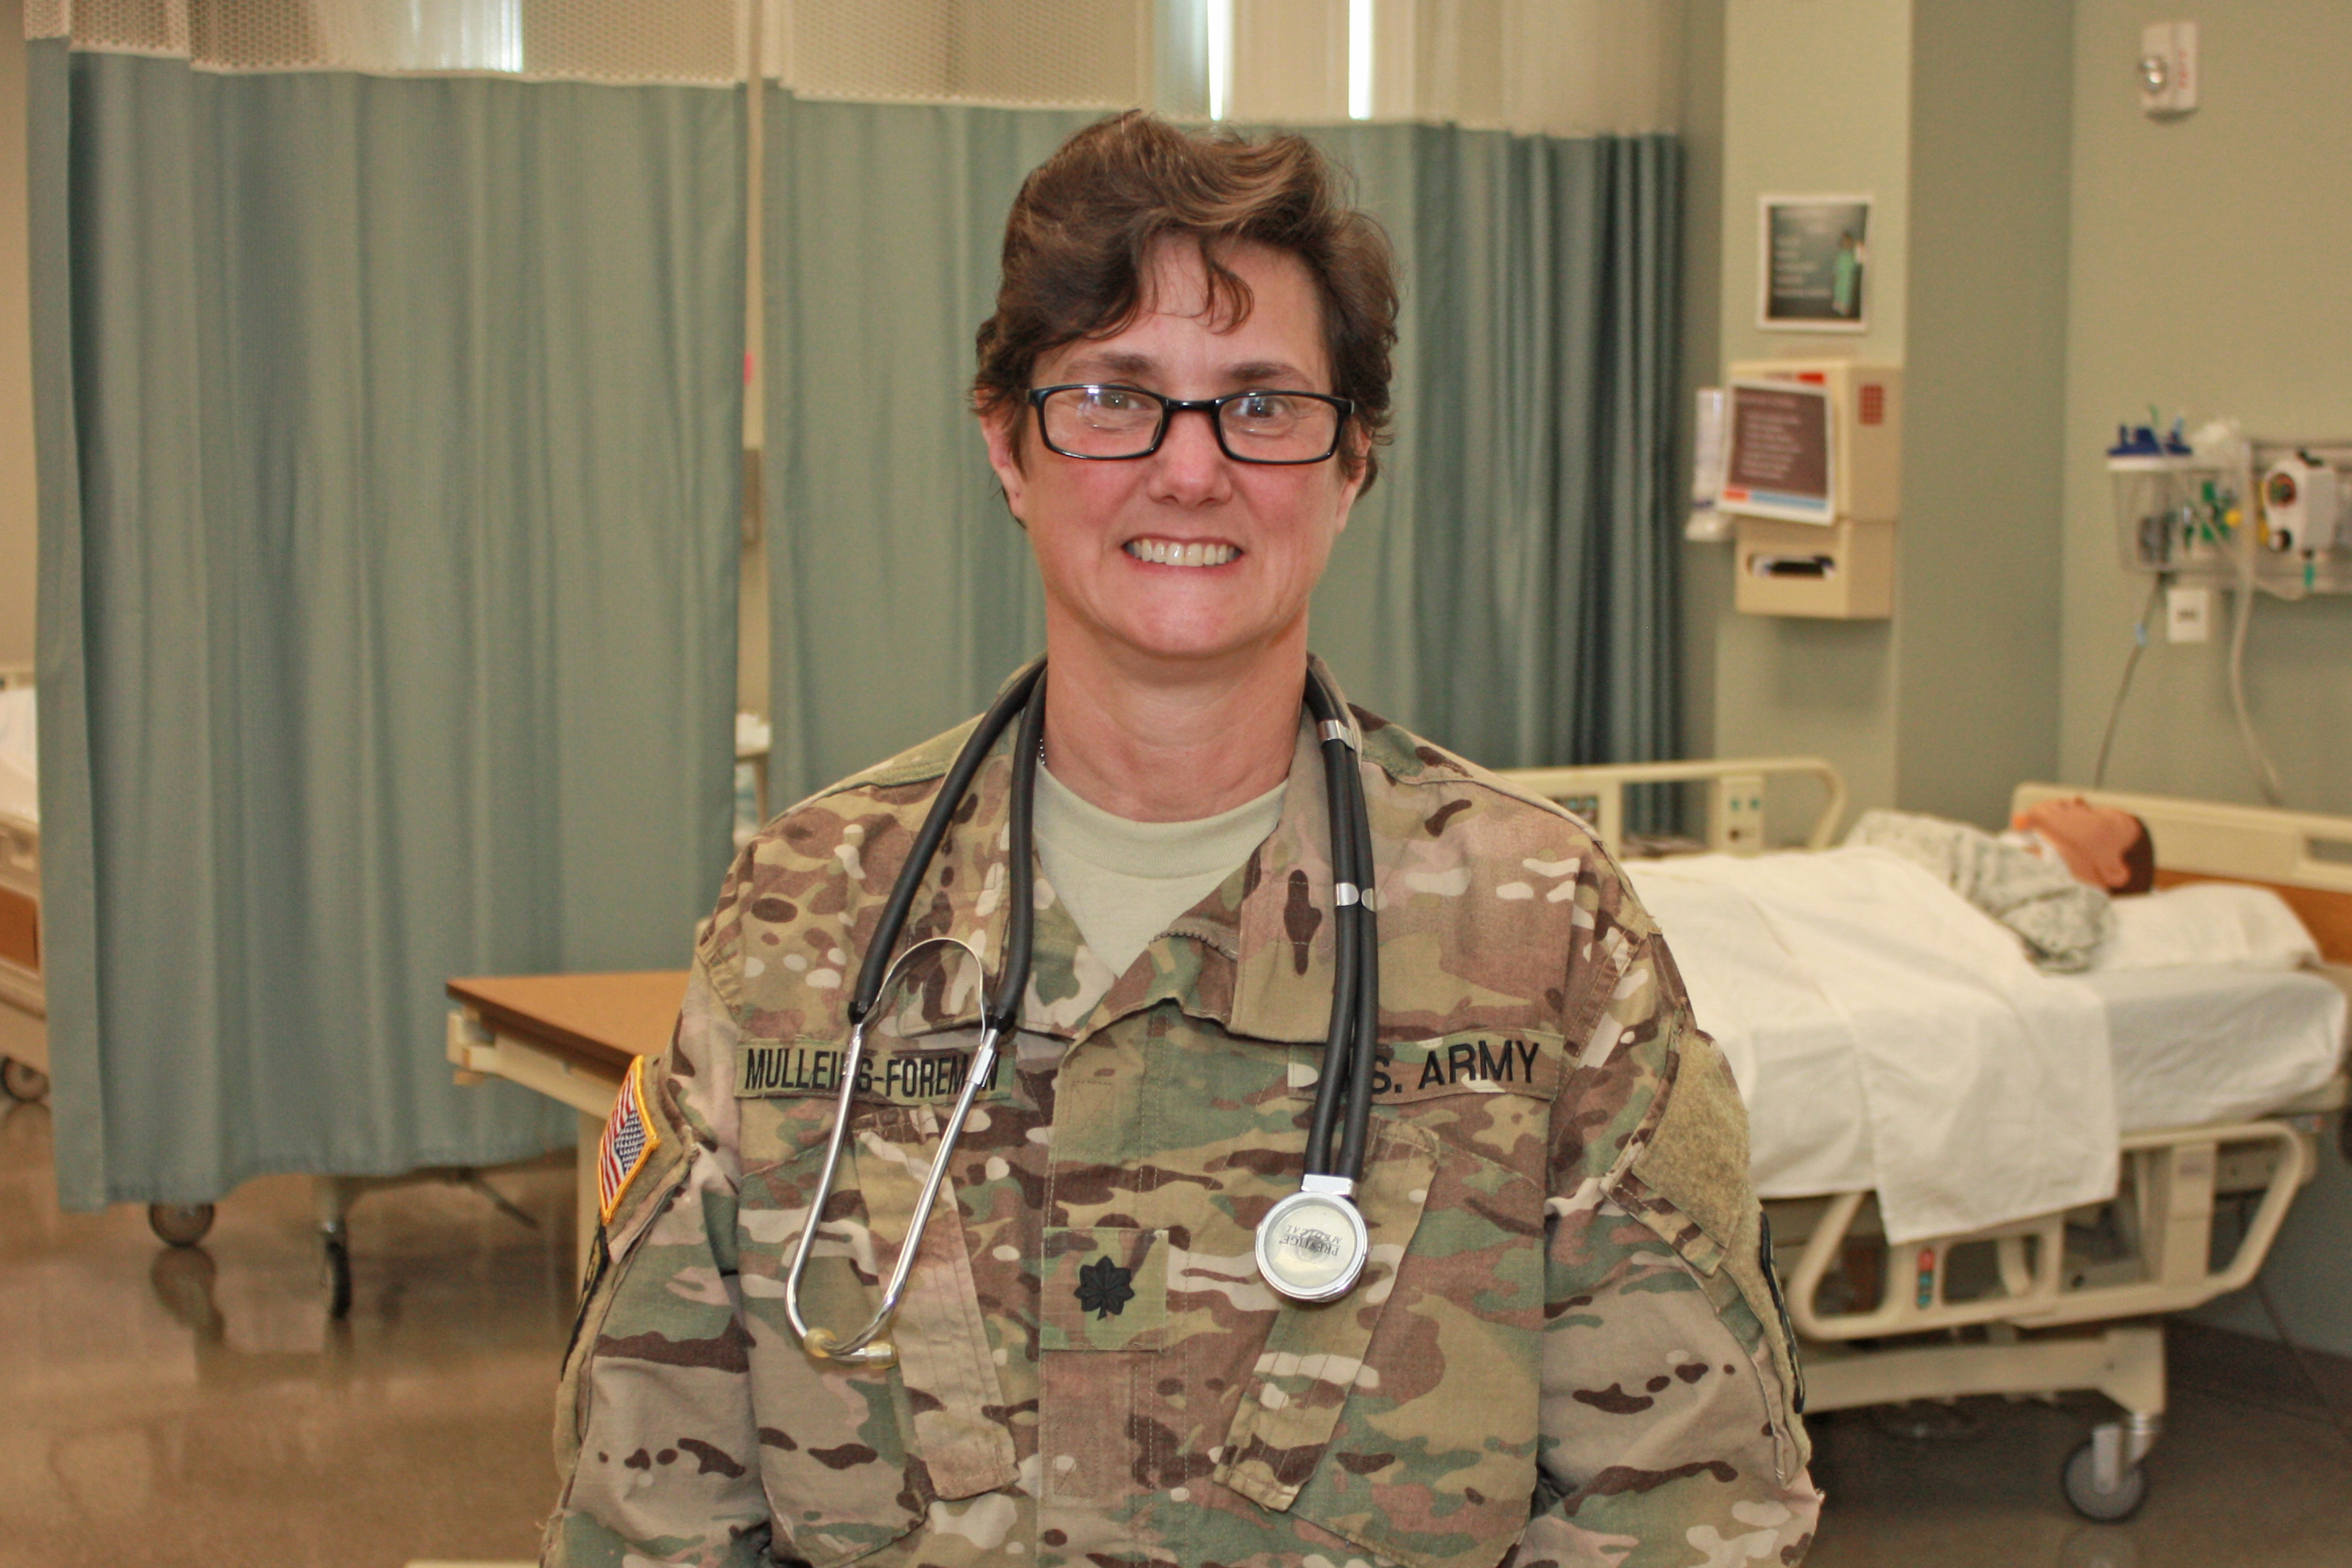 Ramona Mulleins Foreman in uniform